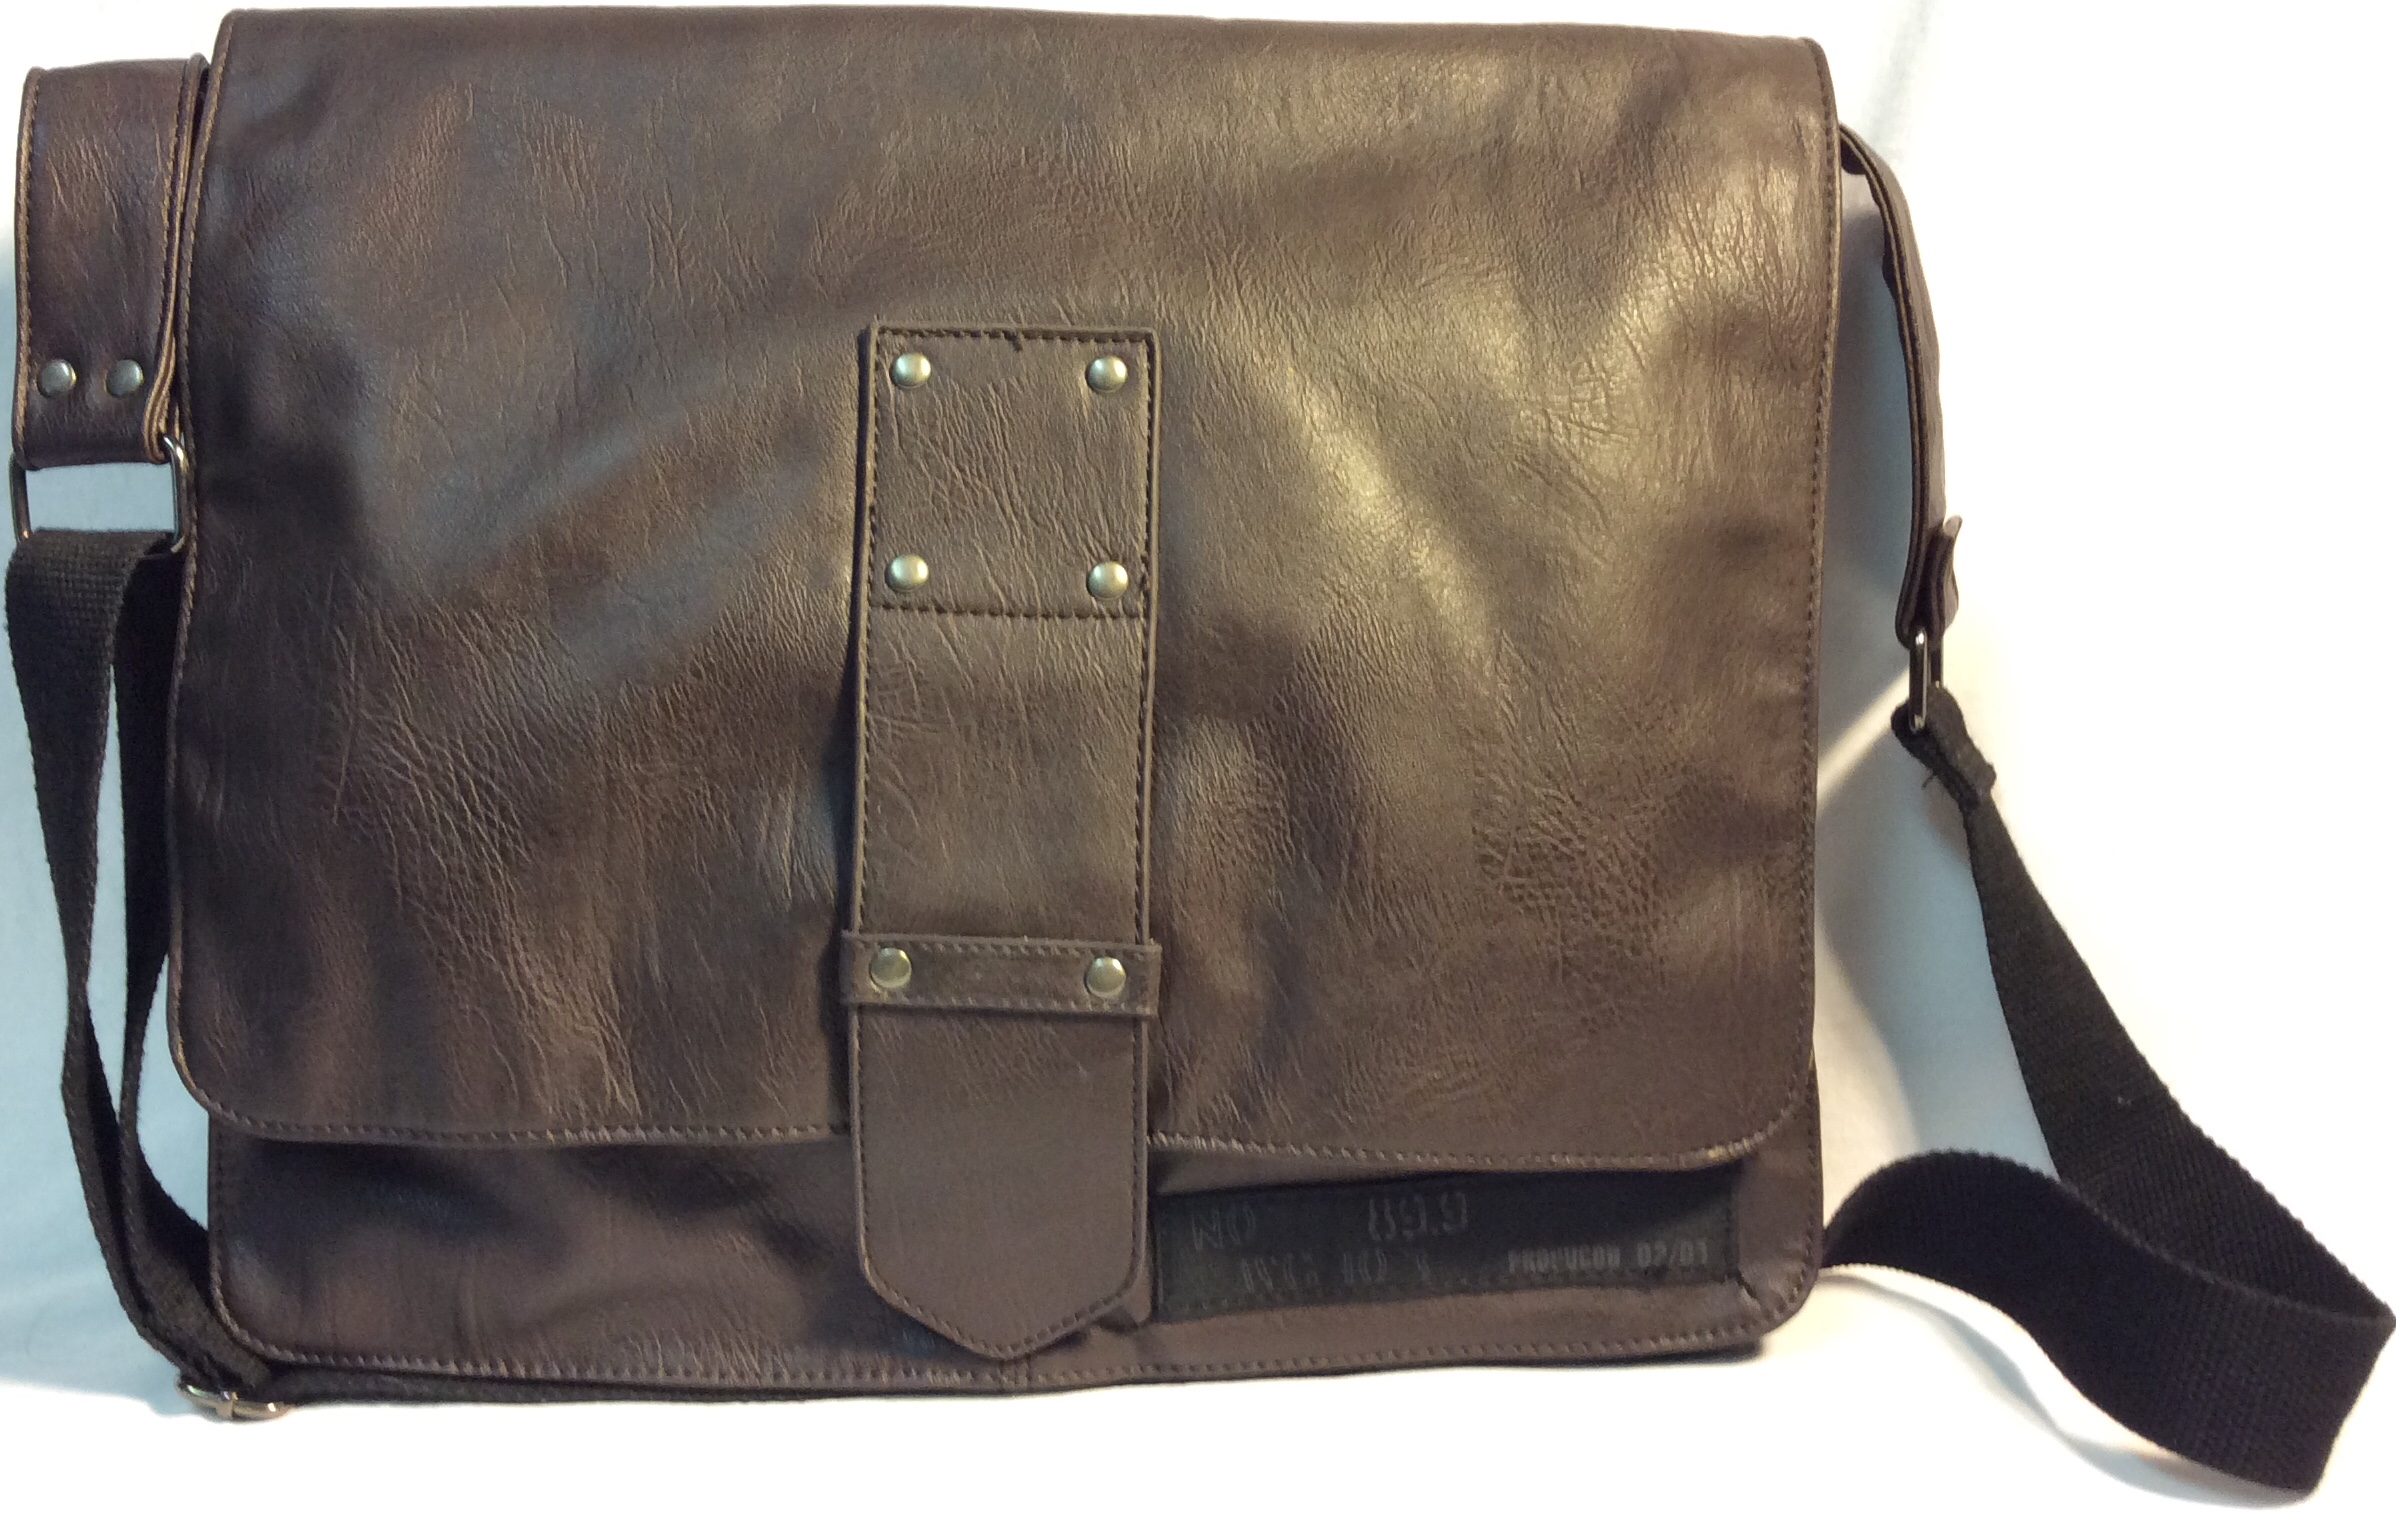 Urban Behavior Brown leather satchel bag with front buckle